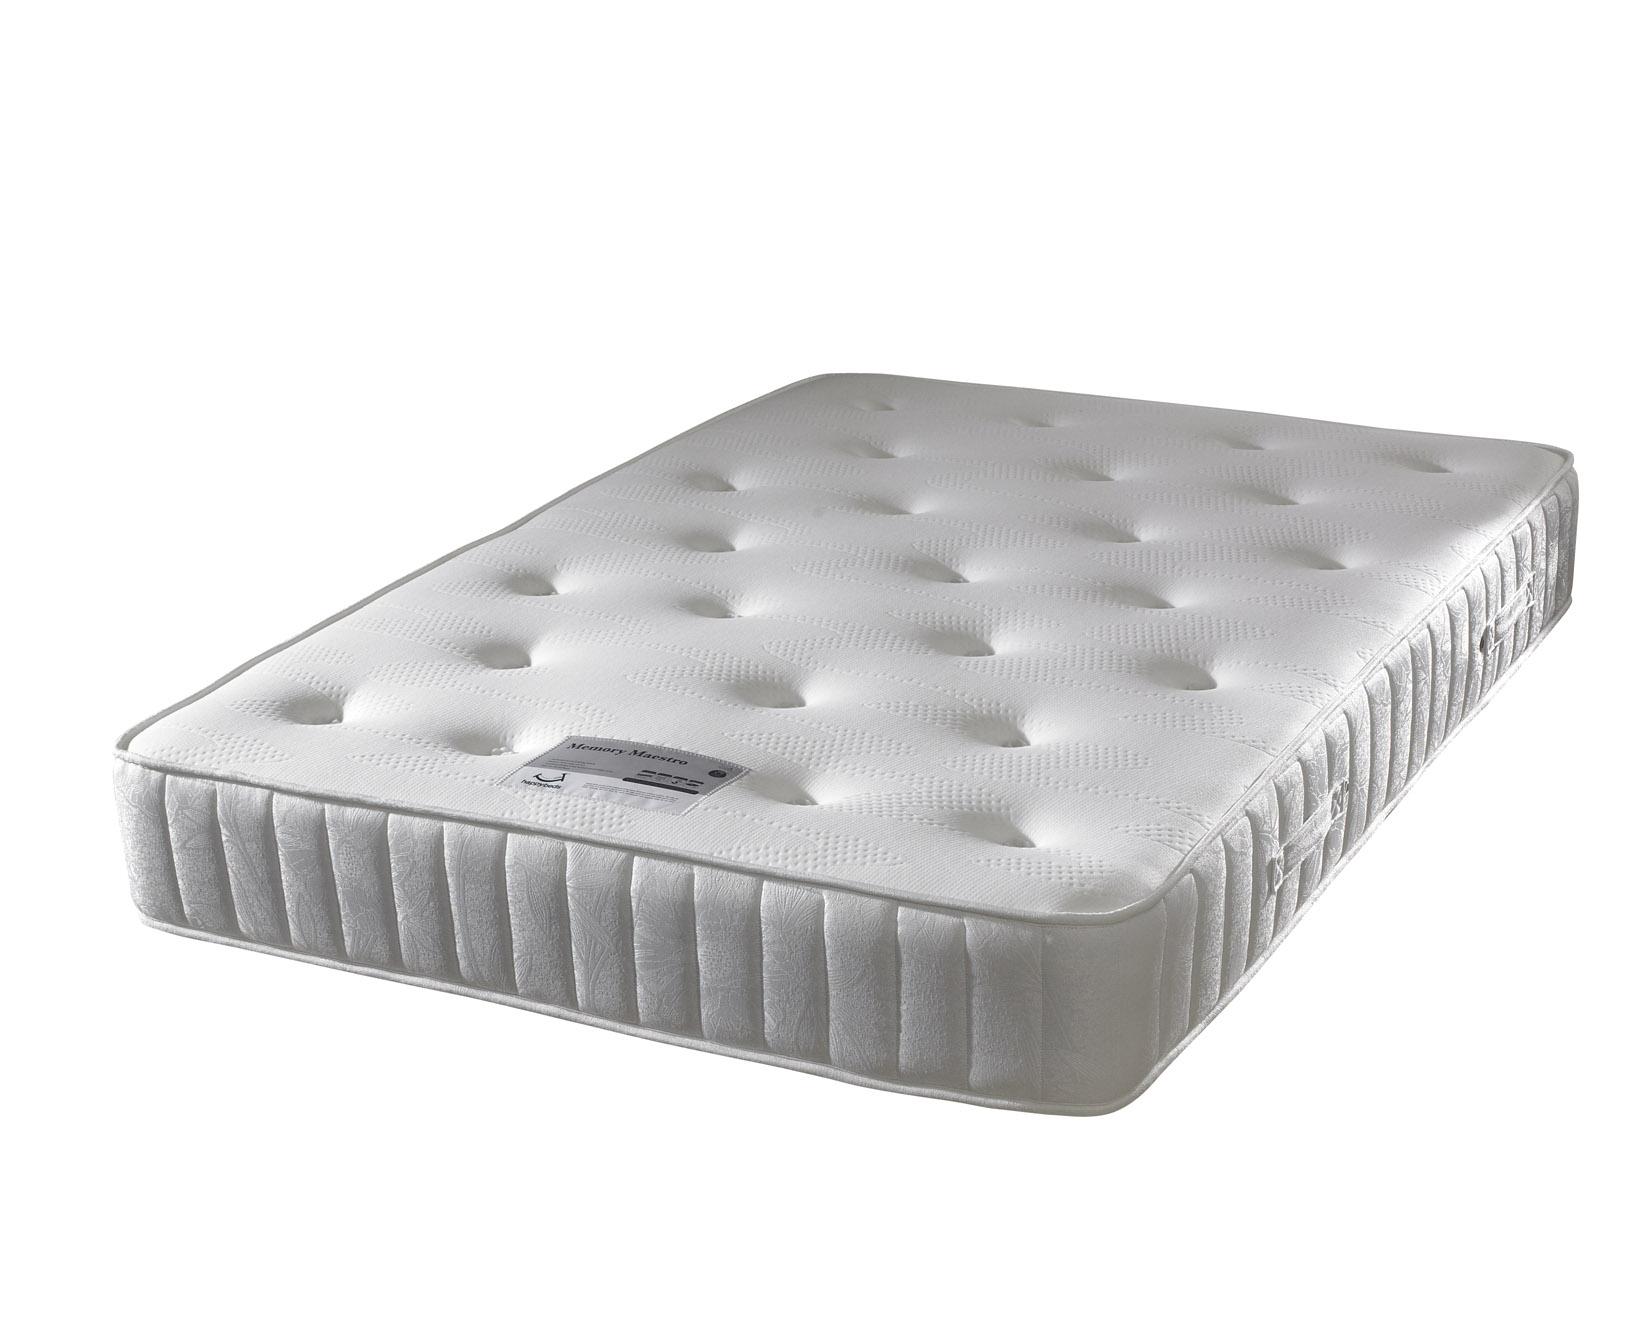 Happy Beds Memory Maestro Memory Foam Mattress Handmade Bonnell Spring Support Ebay